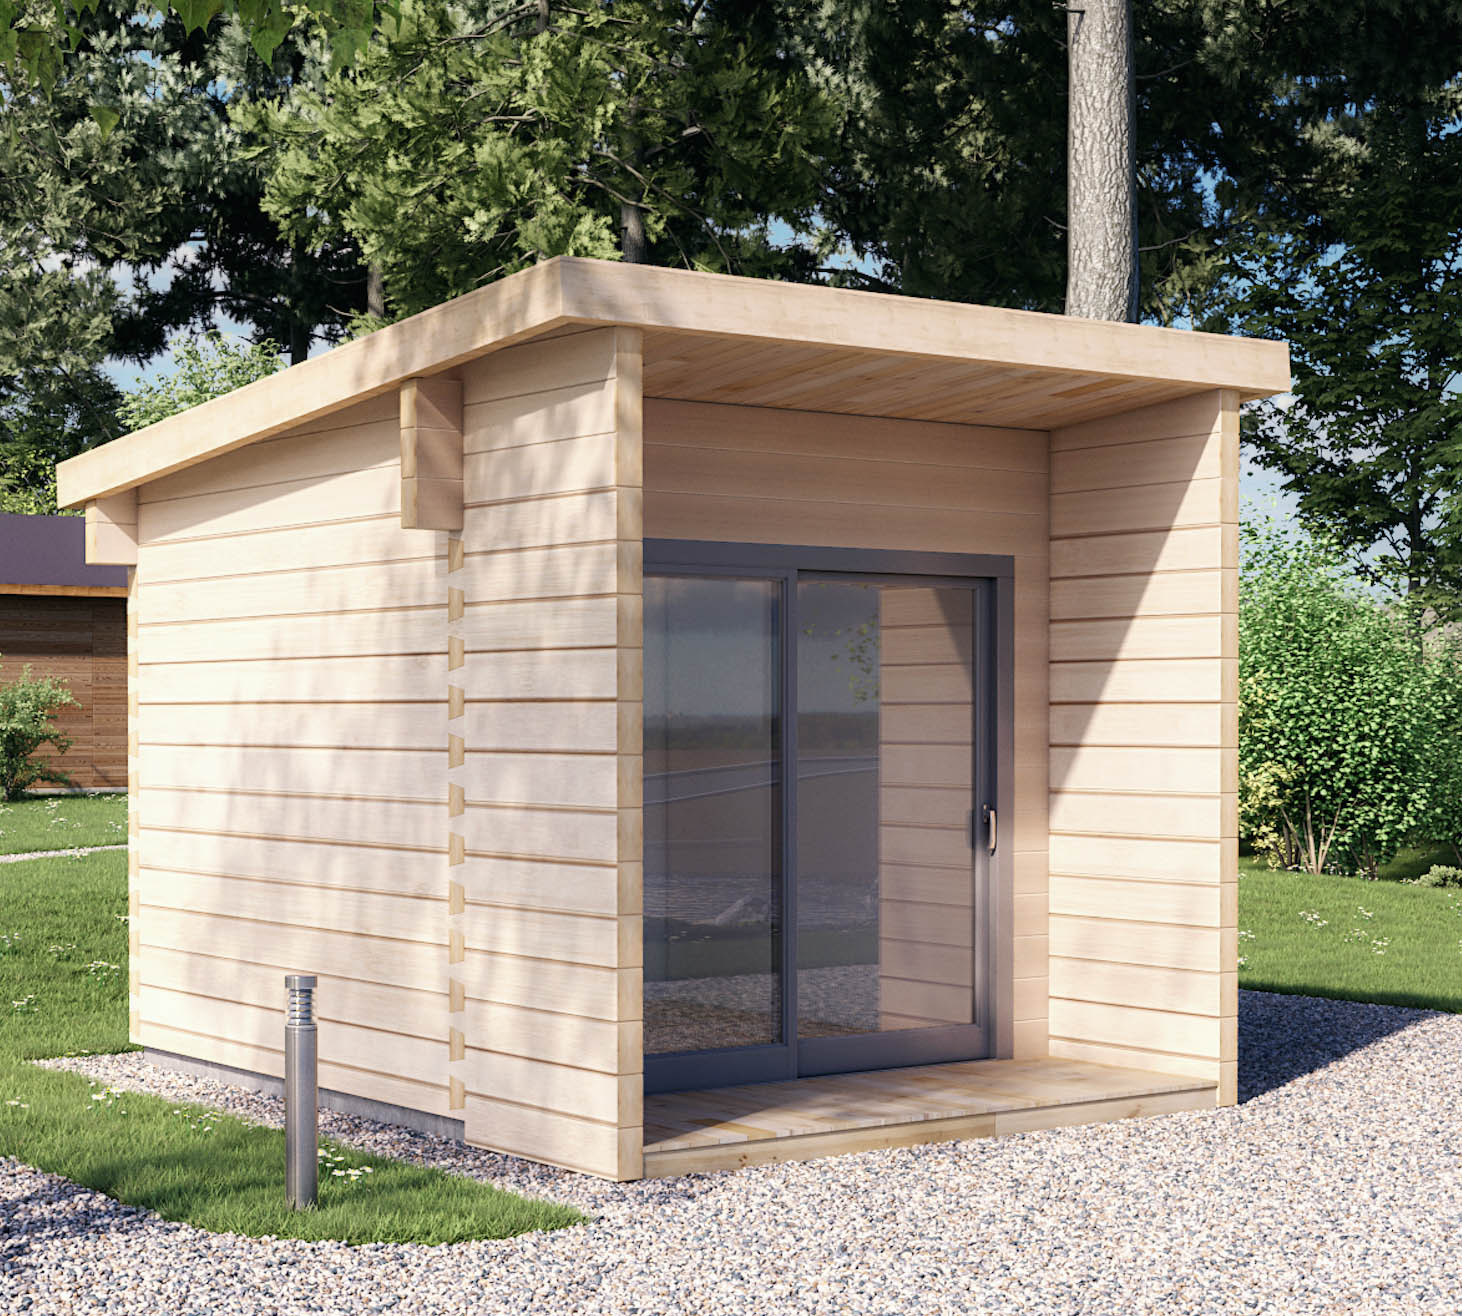 casetta di legno loft 12 koala casette in legno di design